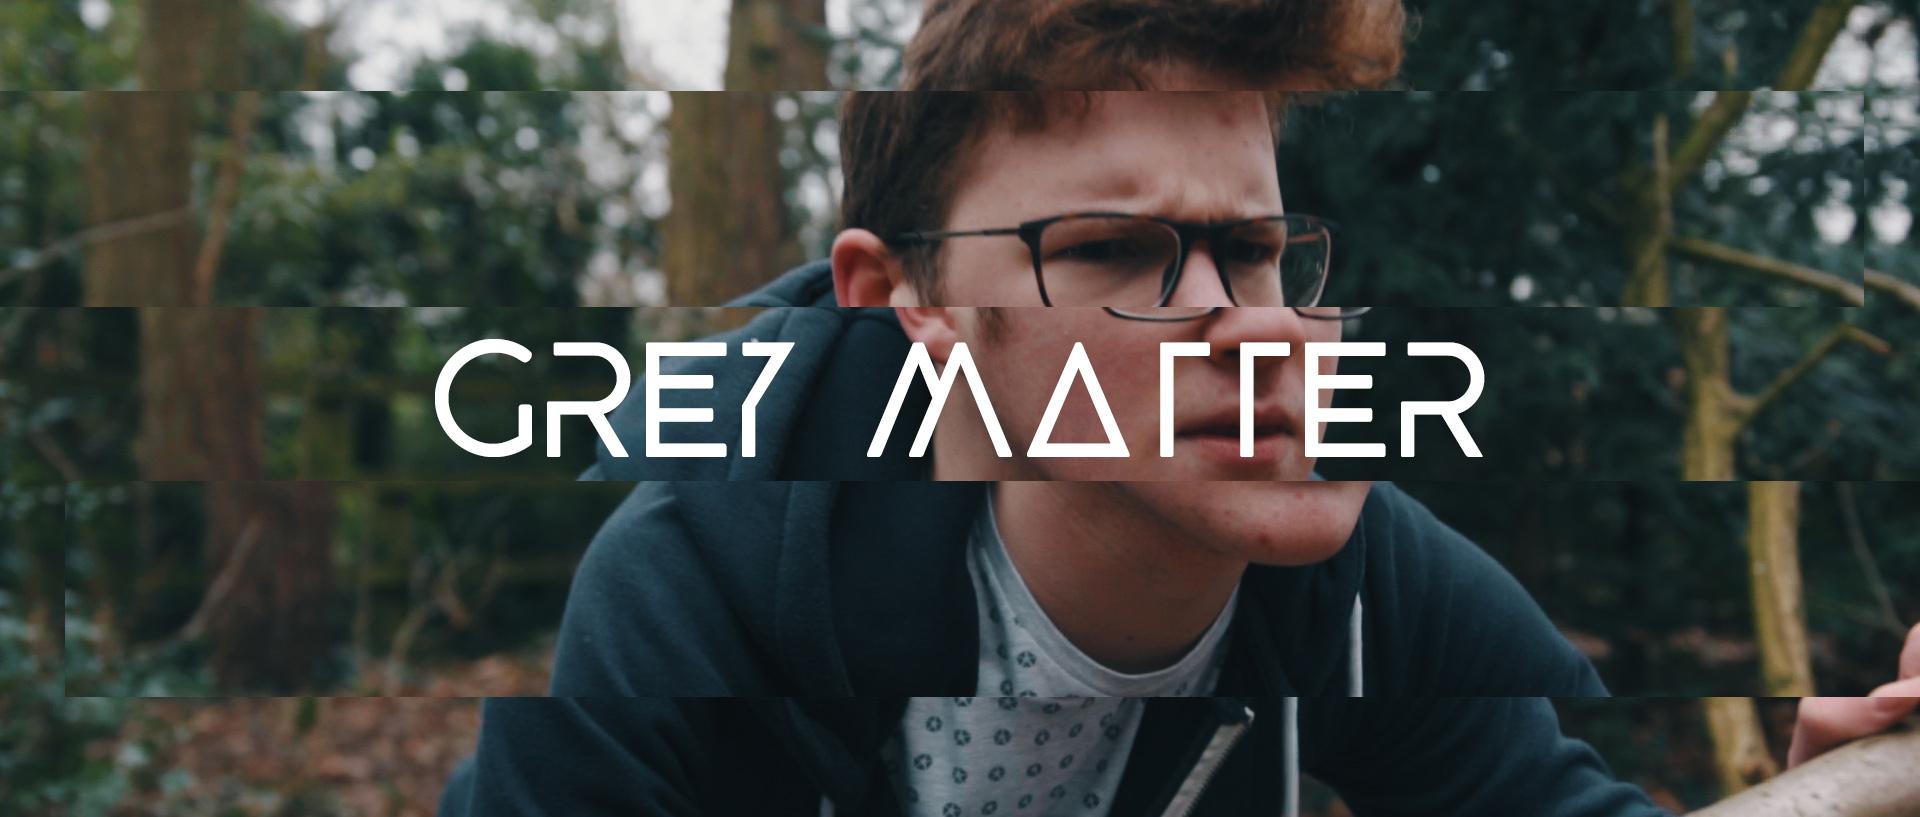 grey matter - short film